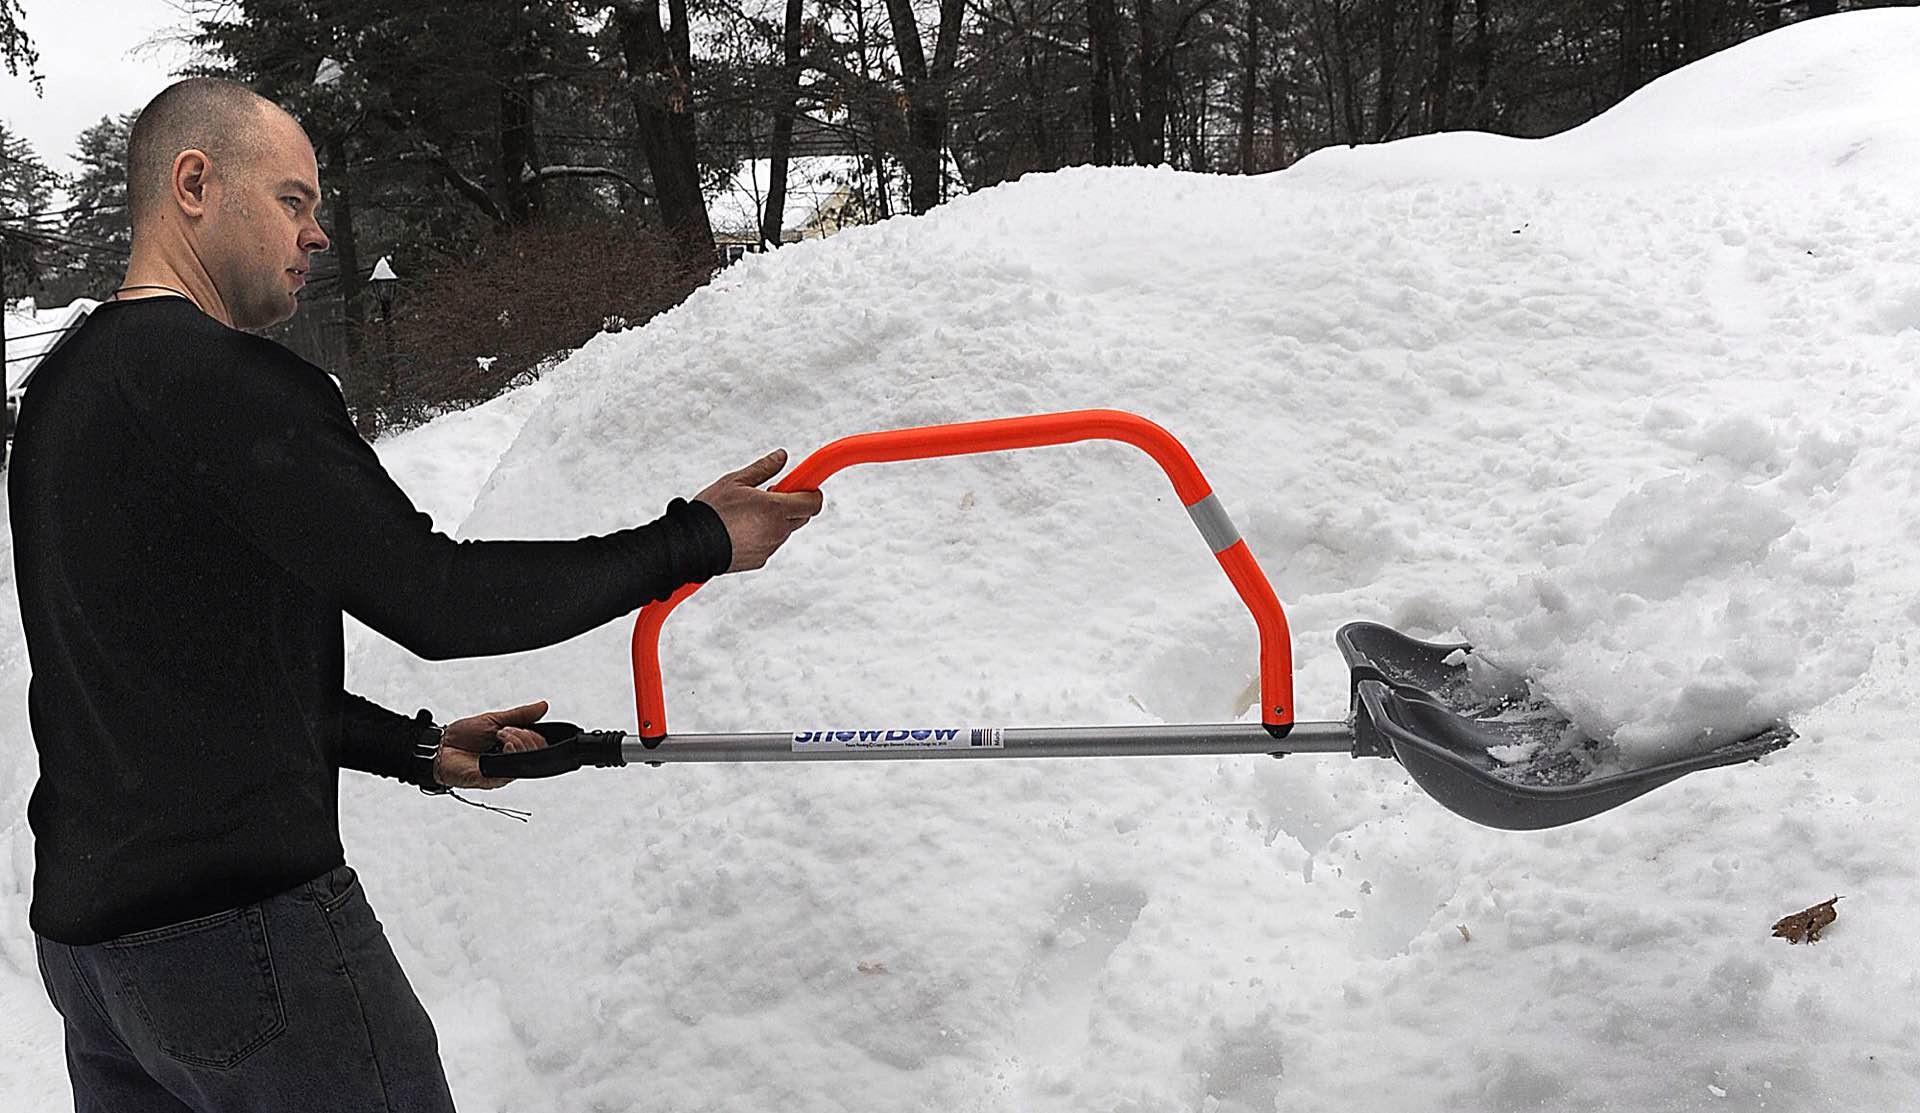 The SnowBow snow shovel. ($40)